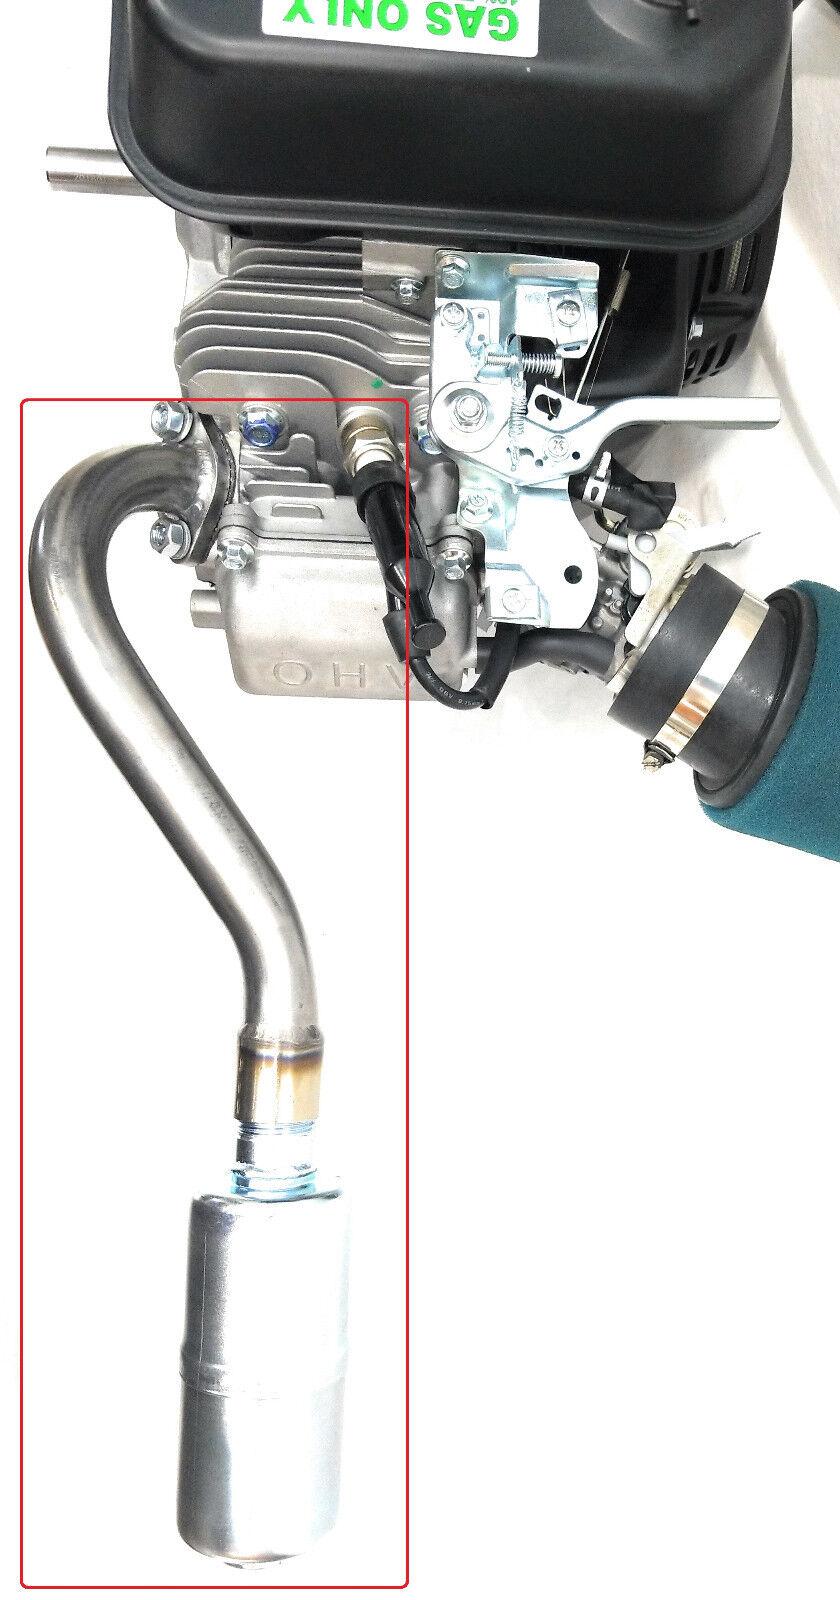 Center Rear Exhaust With Muffler for  Predator 212cc, Honda GX160,GX200,  DuroMa